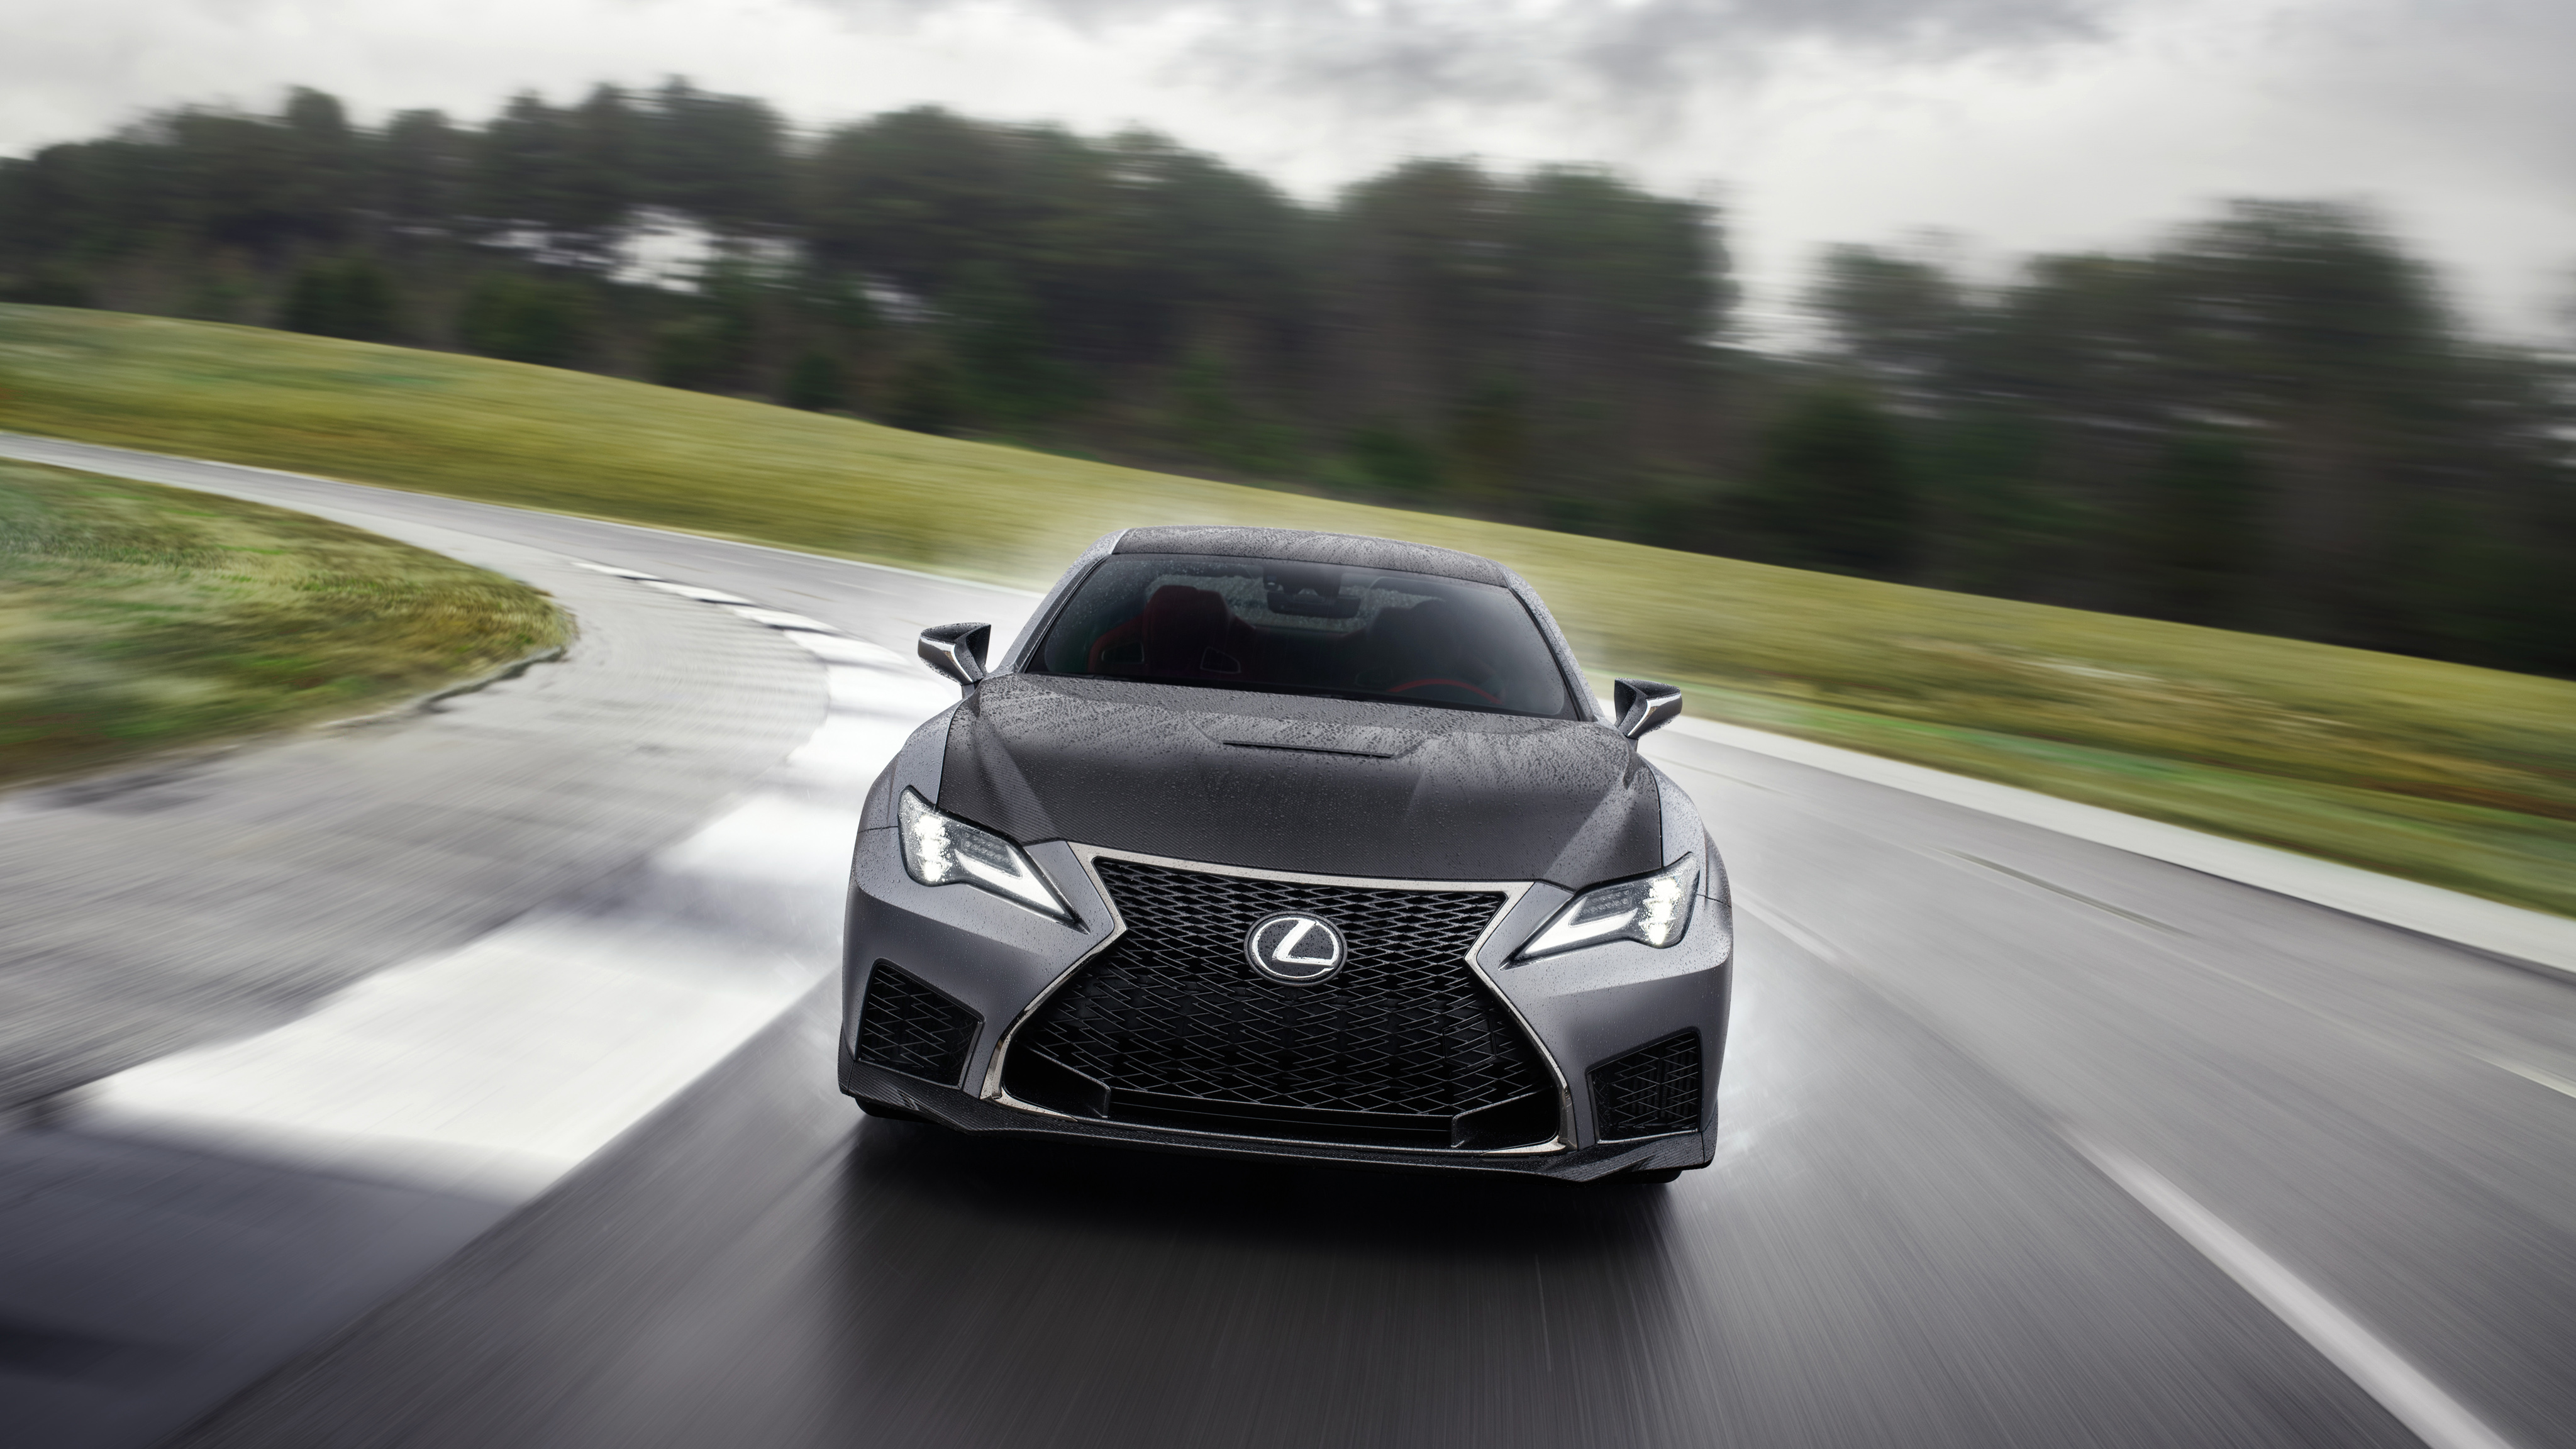 2020 Lexus RC F Track Edition 4K 4 Wallpaper | HD Car Wallpapers | ID #11899